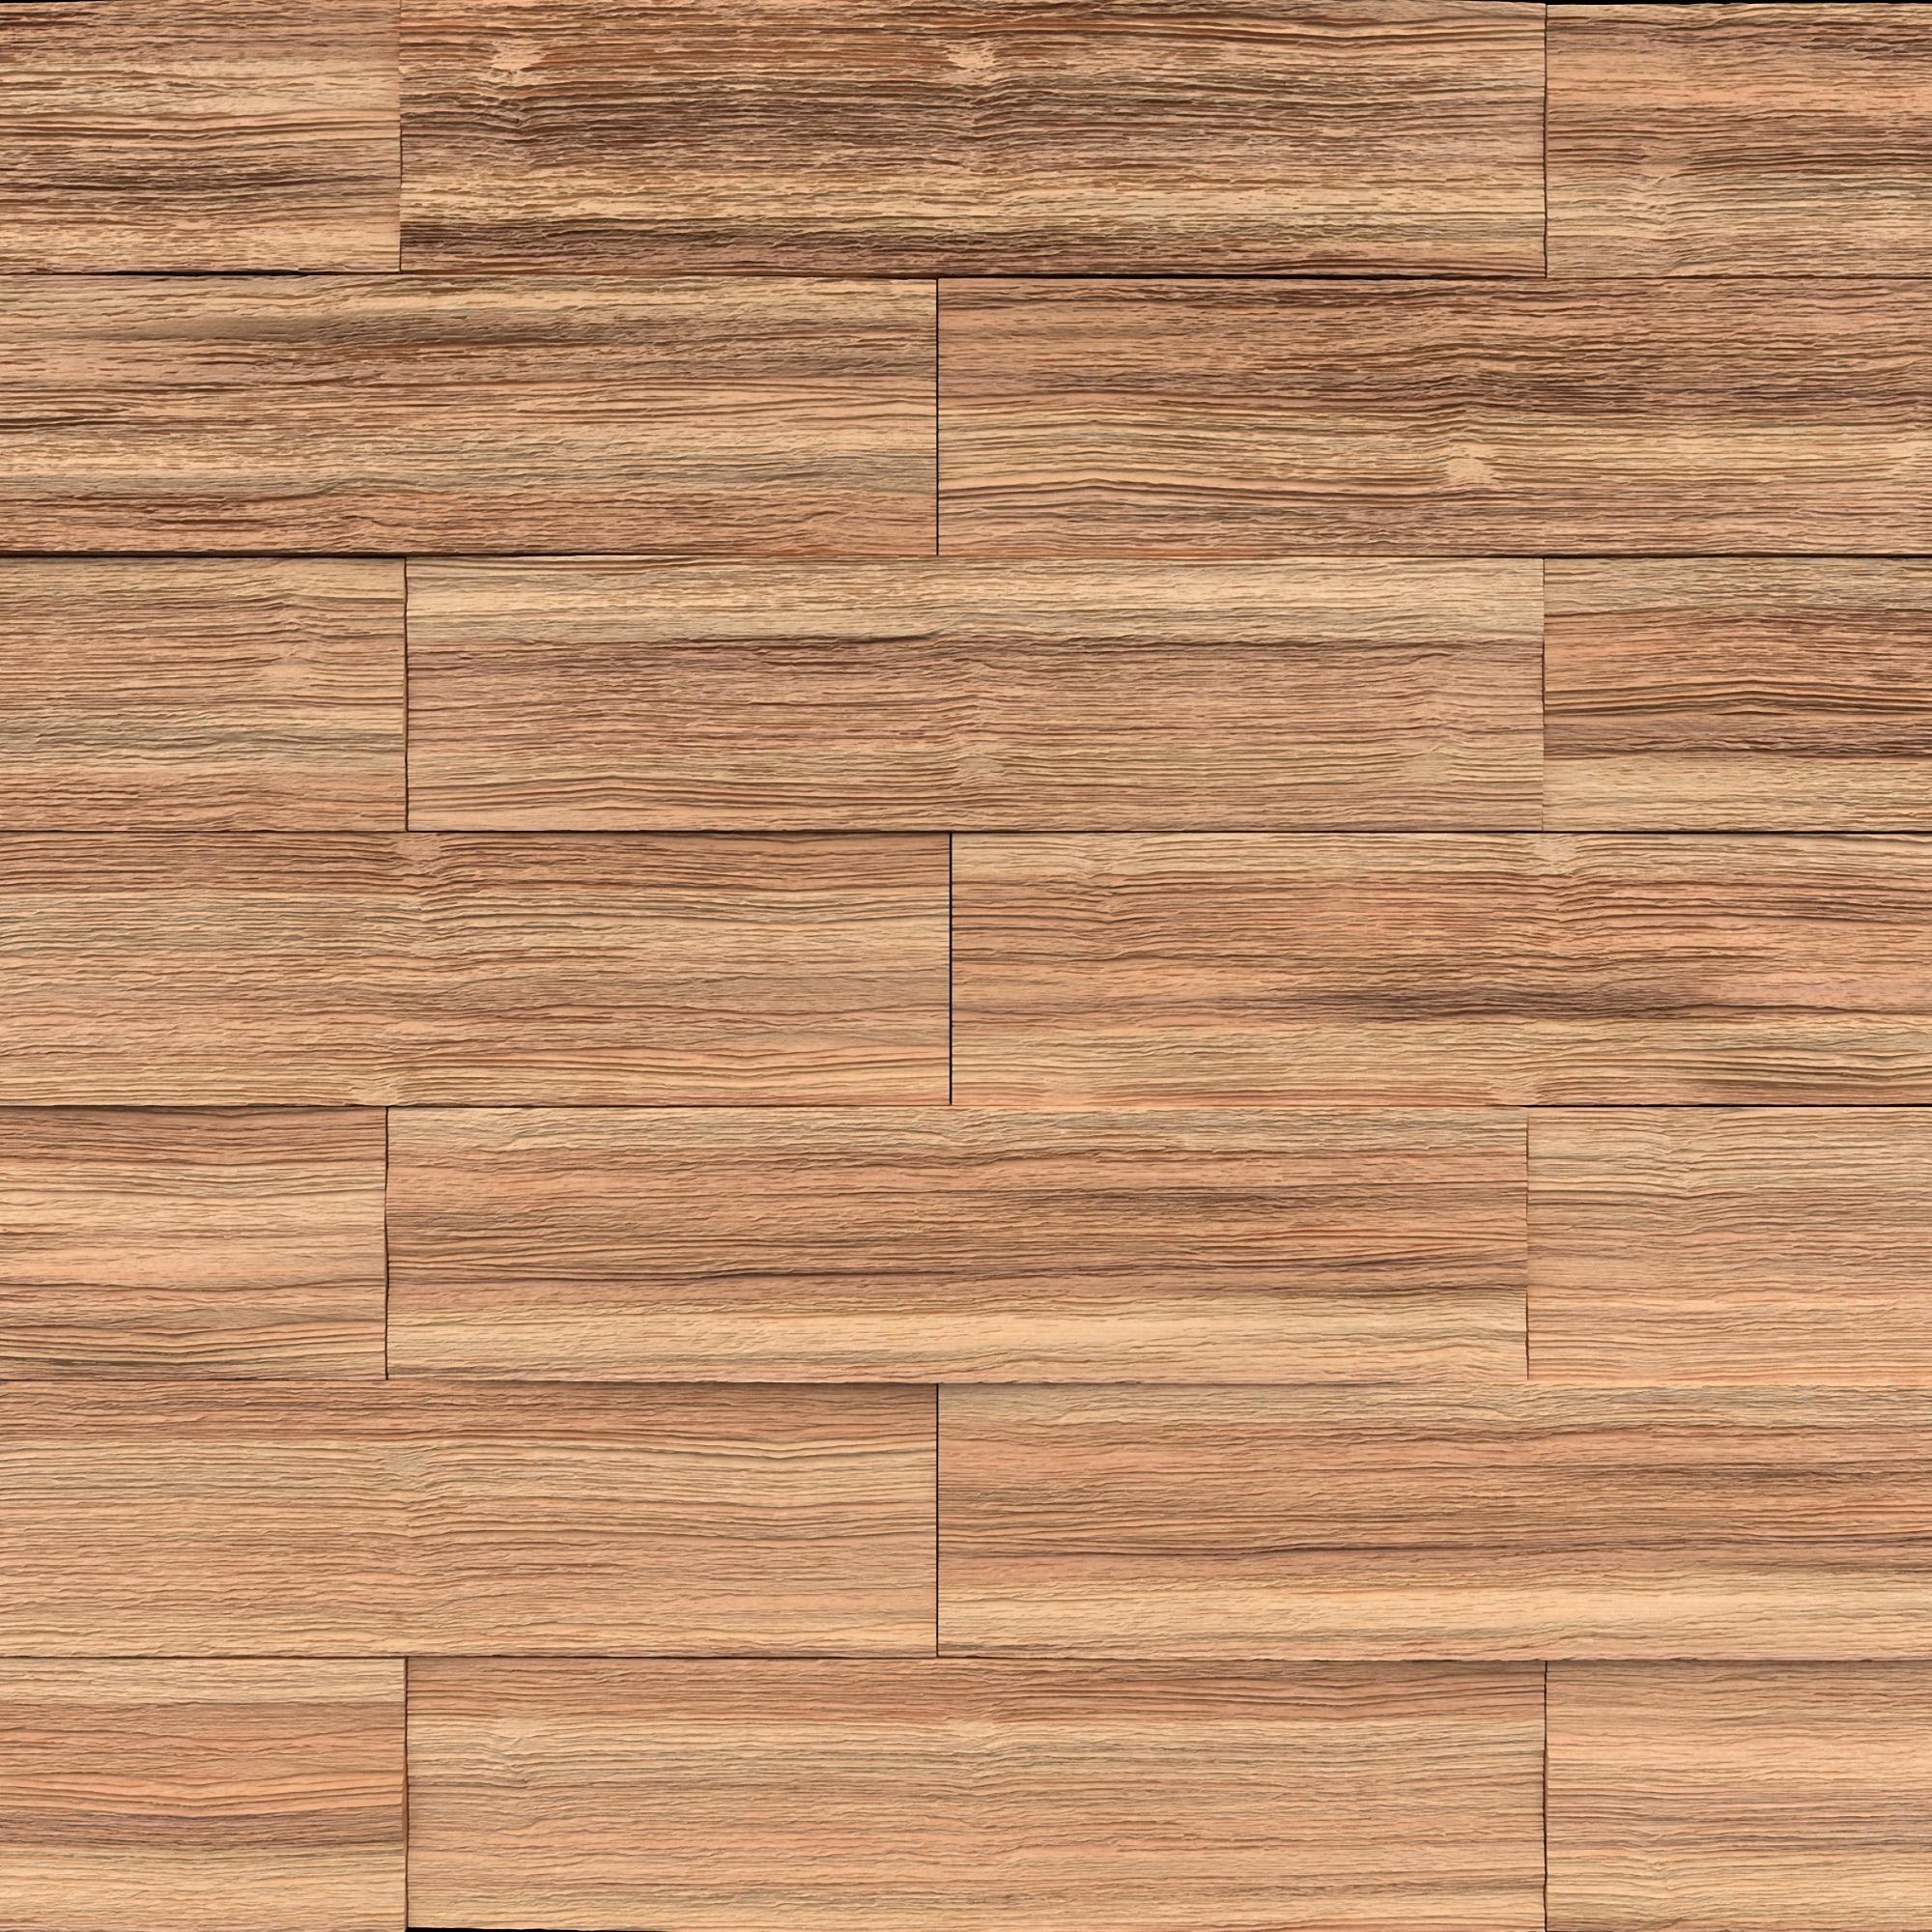 Wooden Parquet Texture Free Image